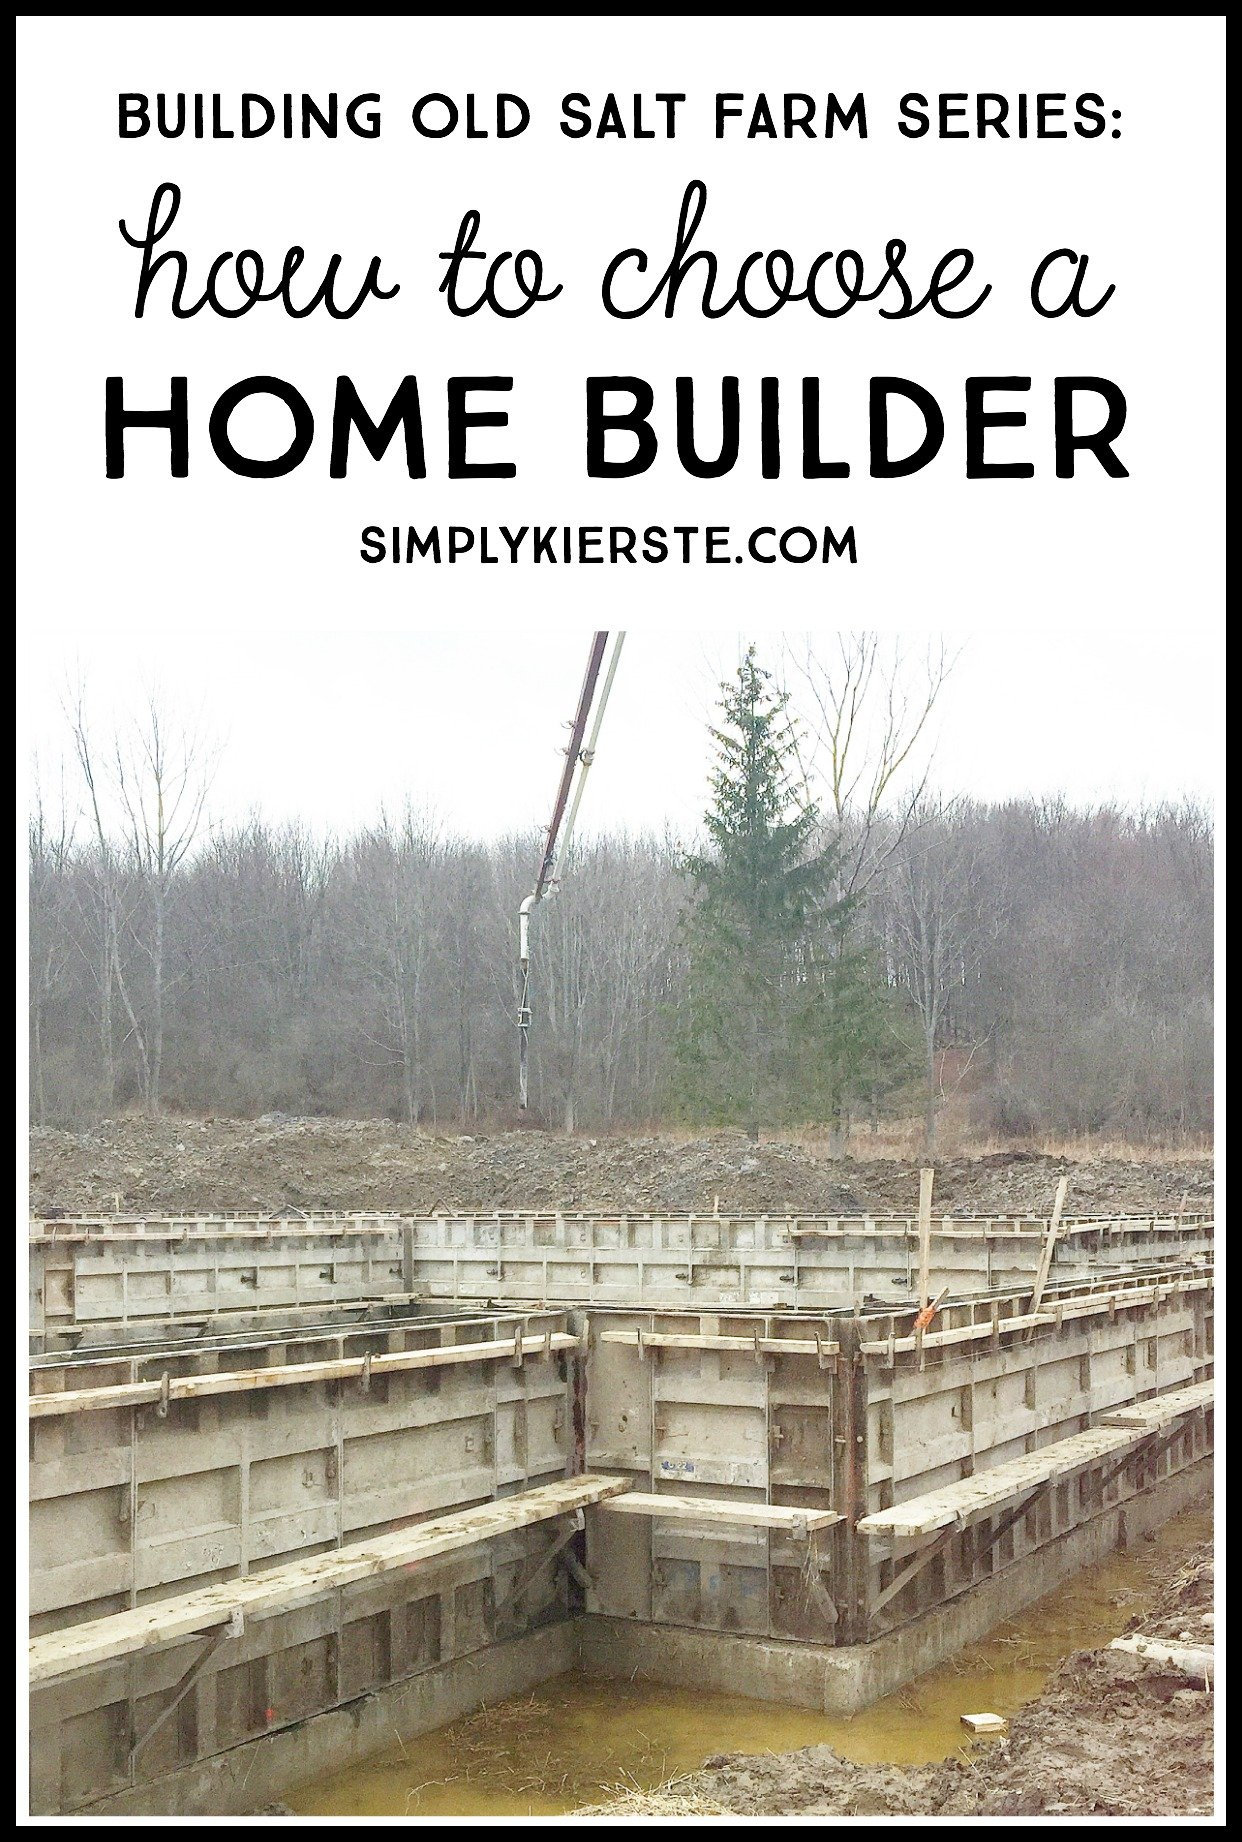 Building Old Salt Farm: How to Choose a Home Builder